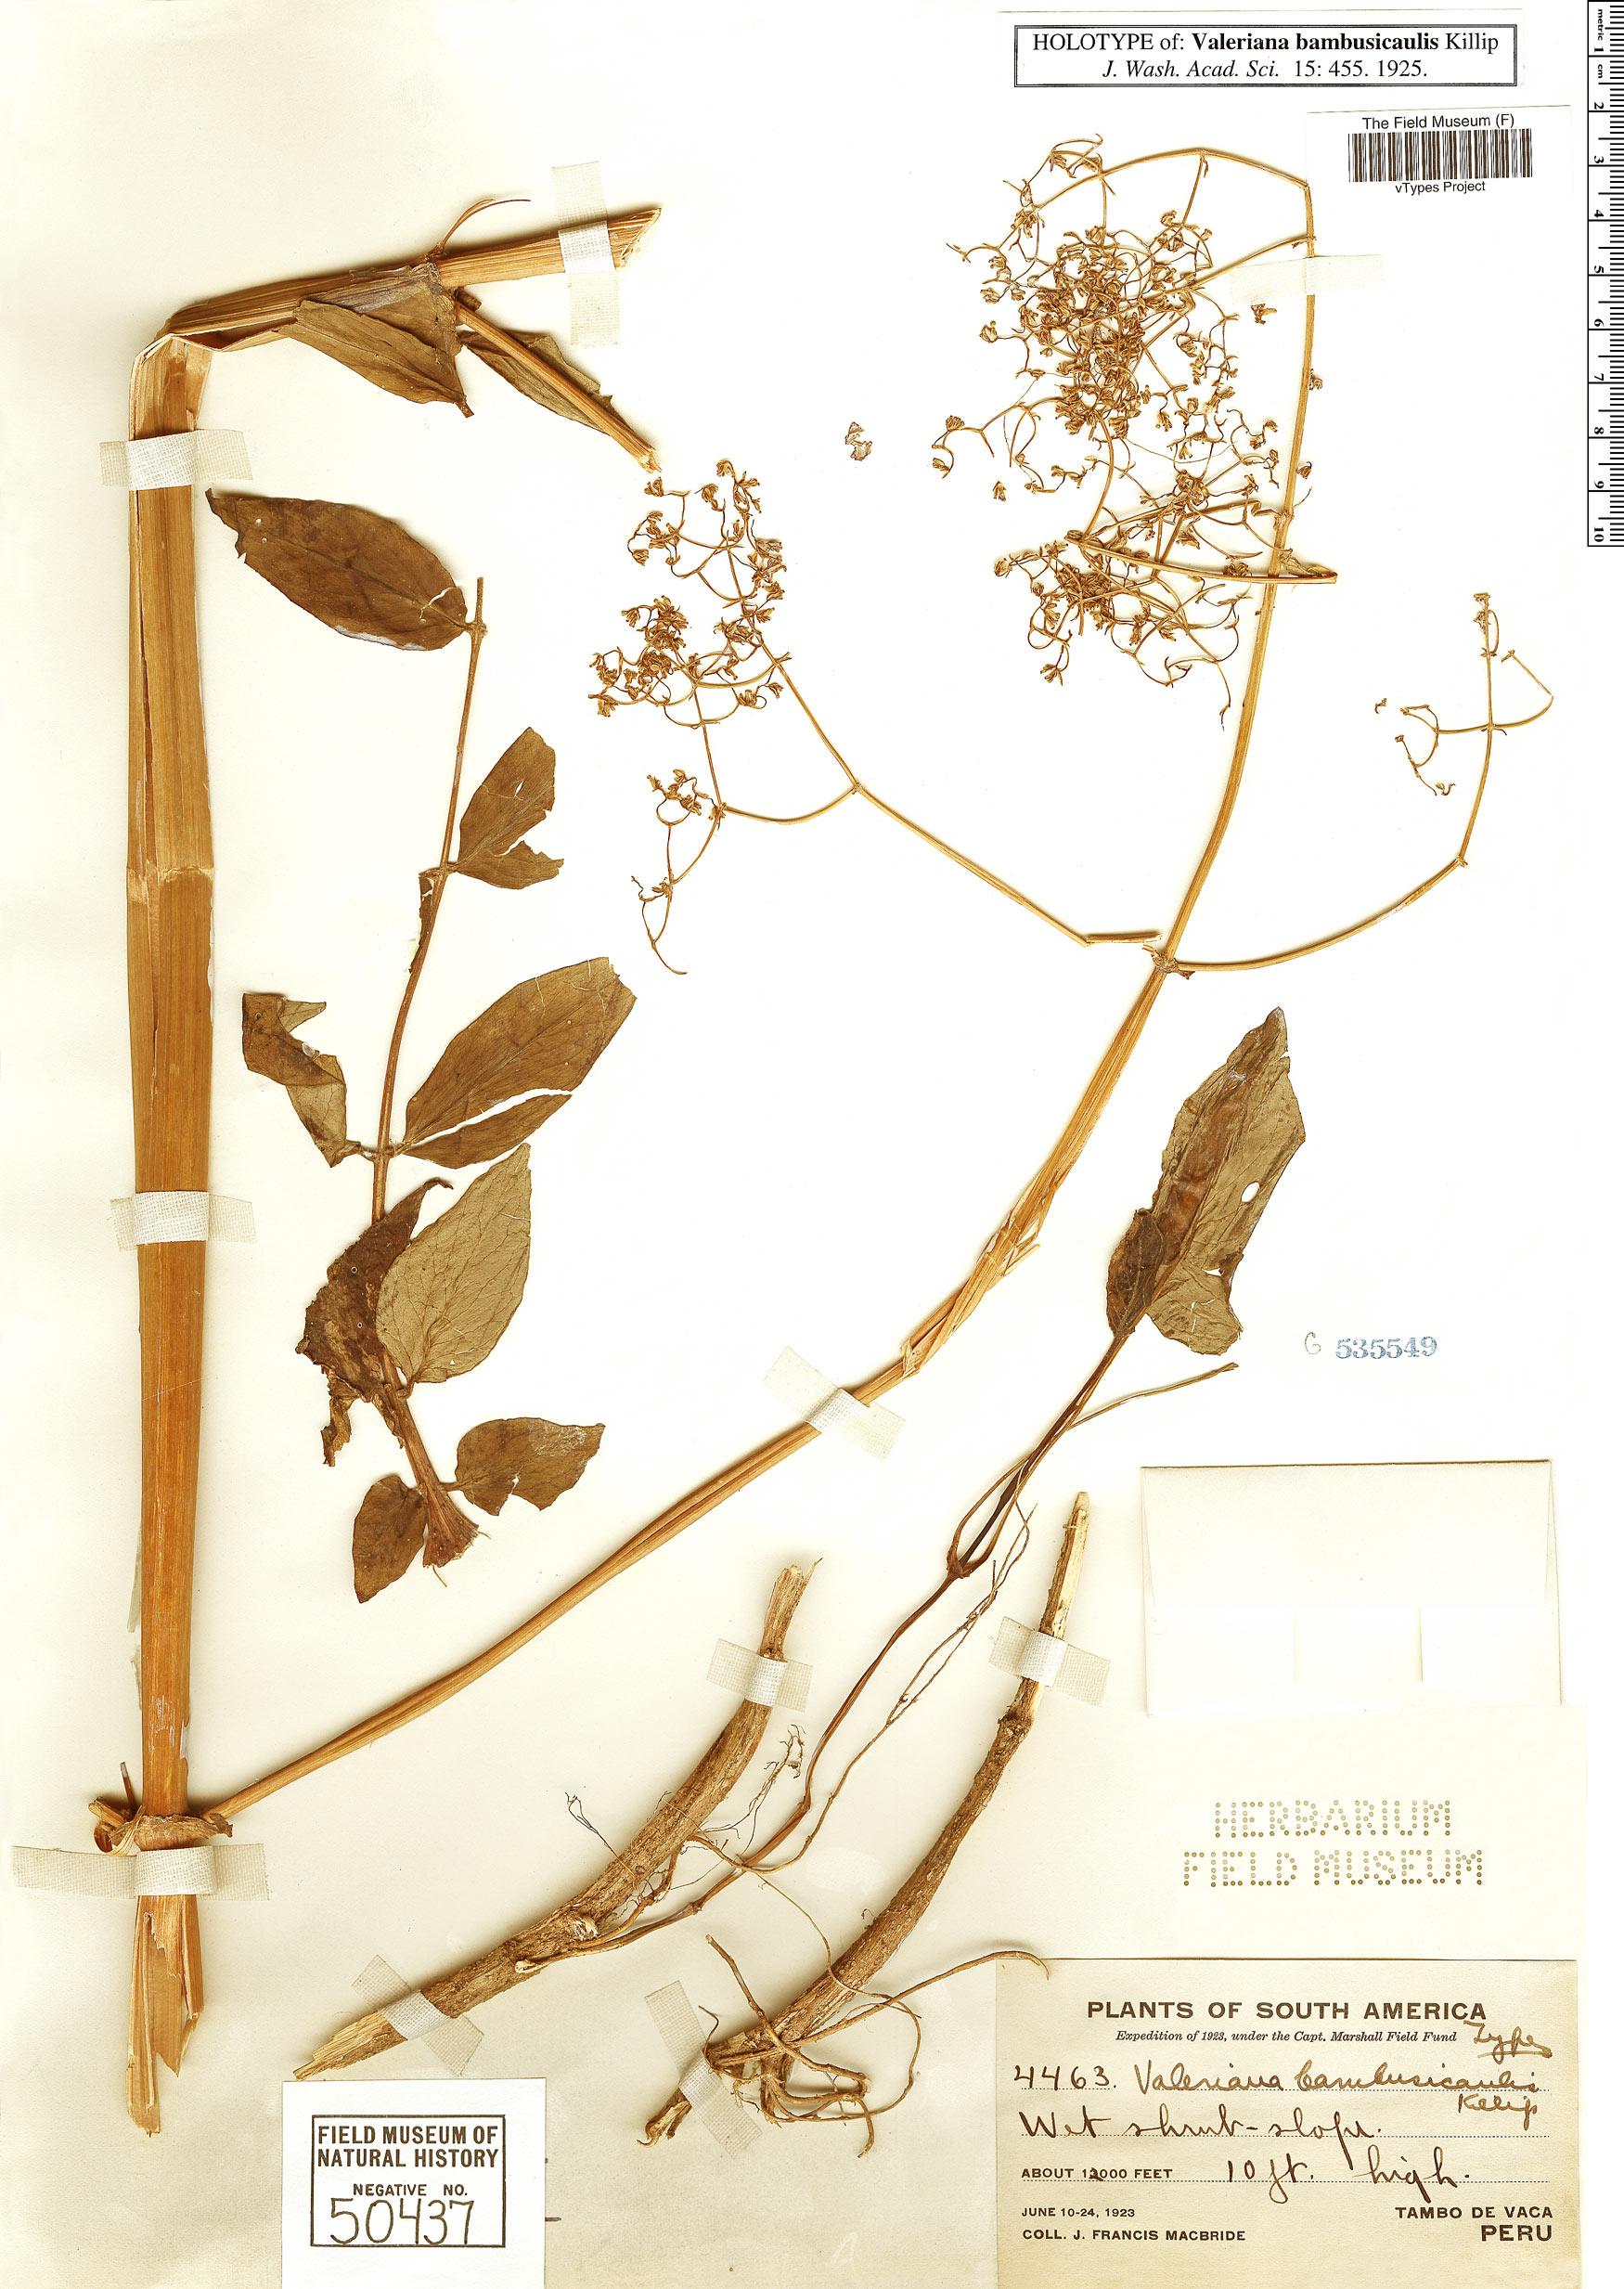 Espécime: Valeriana bambusicaulis